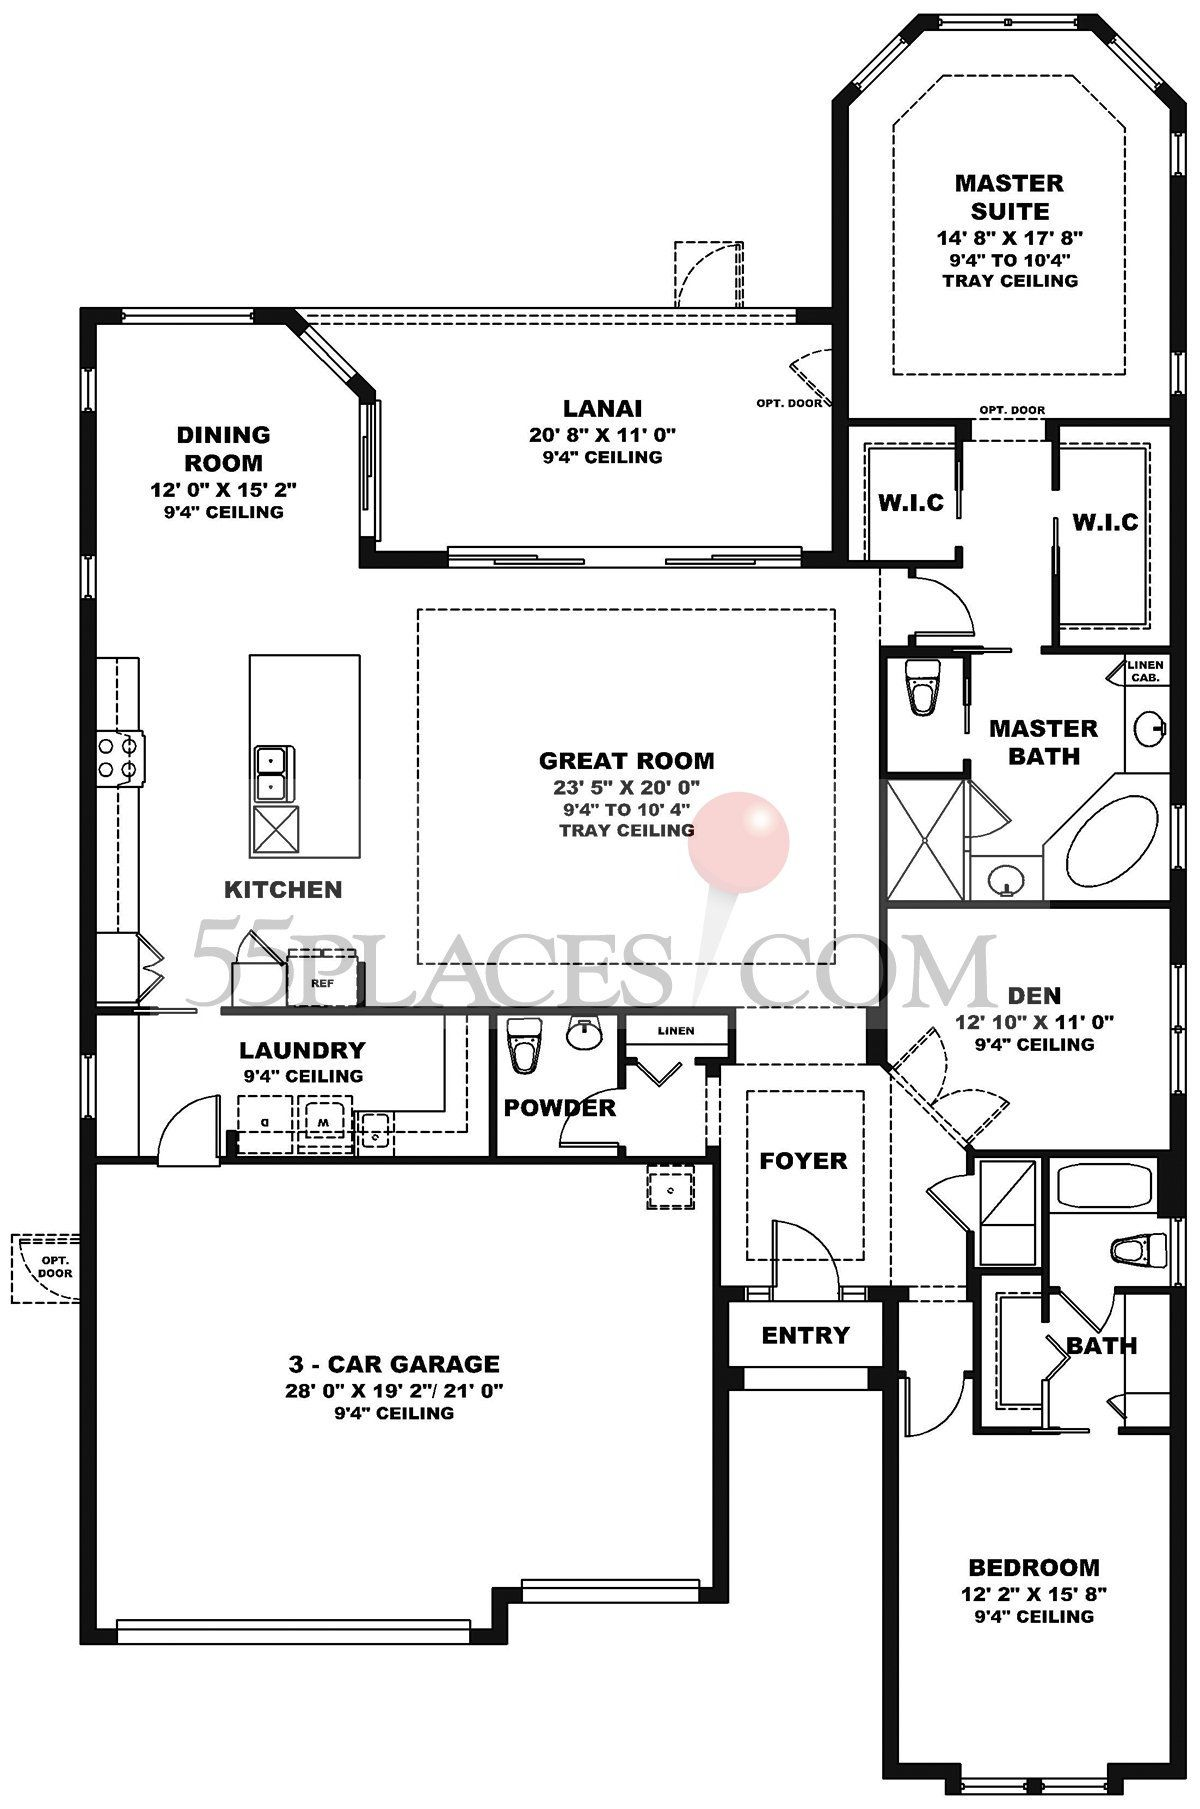 See the 2338 sq. ft. Aruba floor plan at Laude ... Margaritaville Model Plans For Home on plans for gates, plans for apartment complexes, plans for garages, plans for construction, plans for pool, plans for furniture,